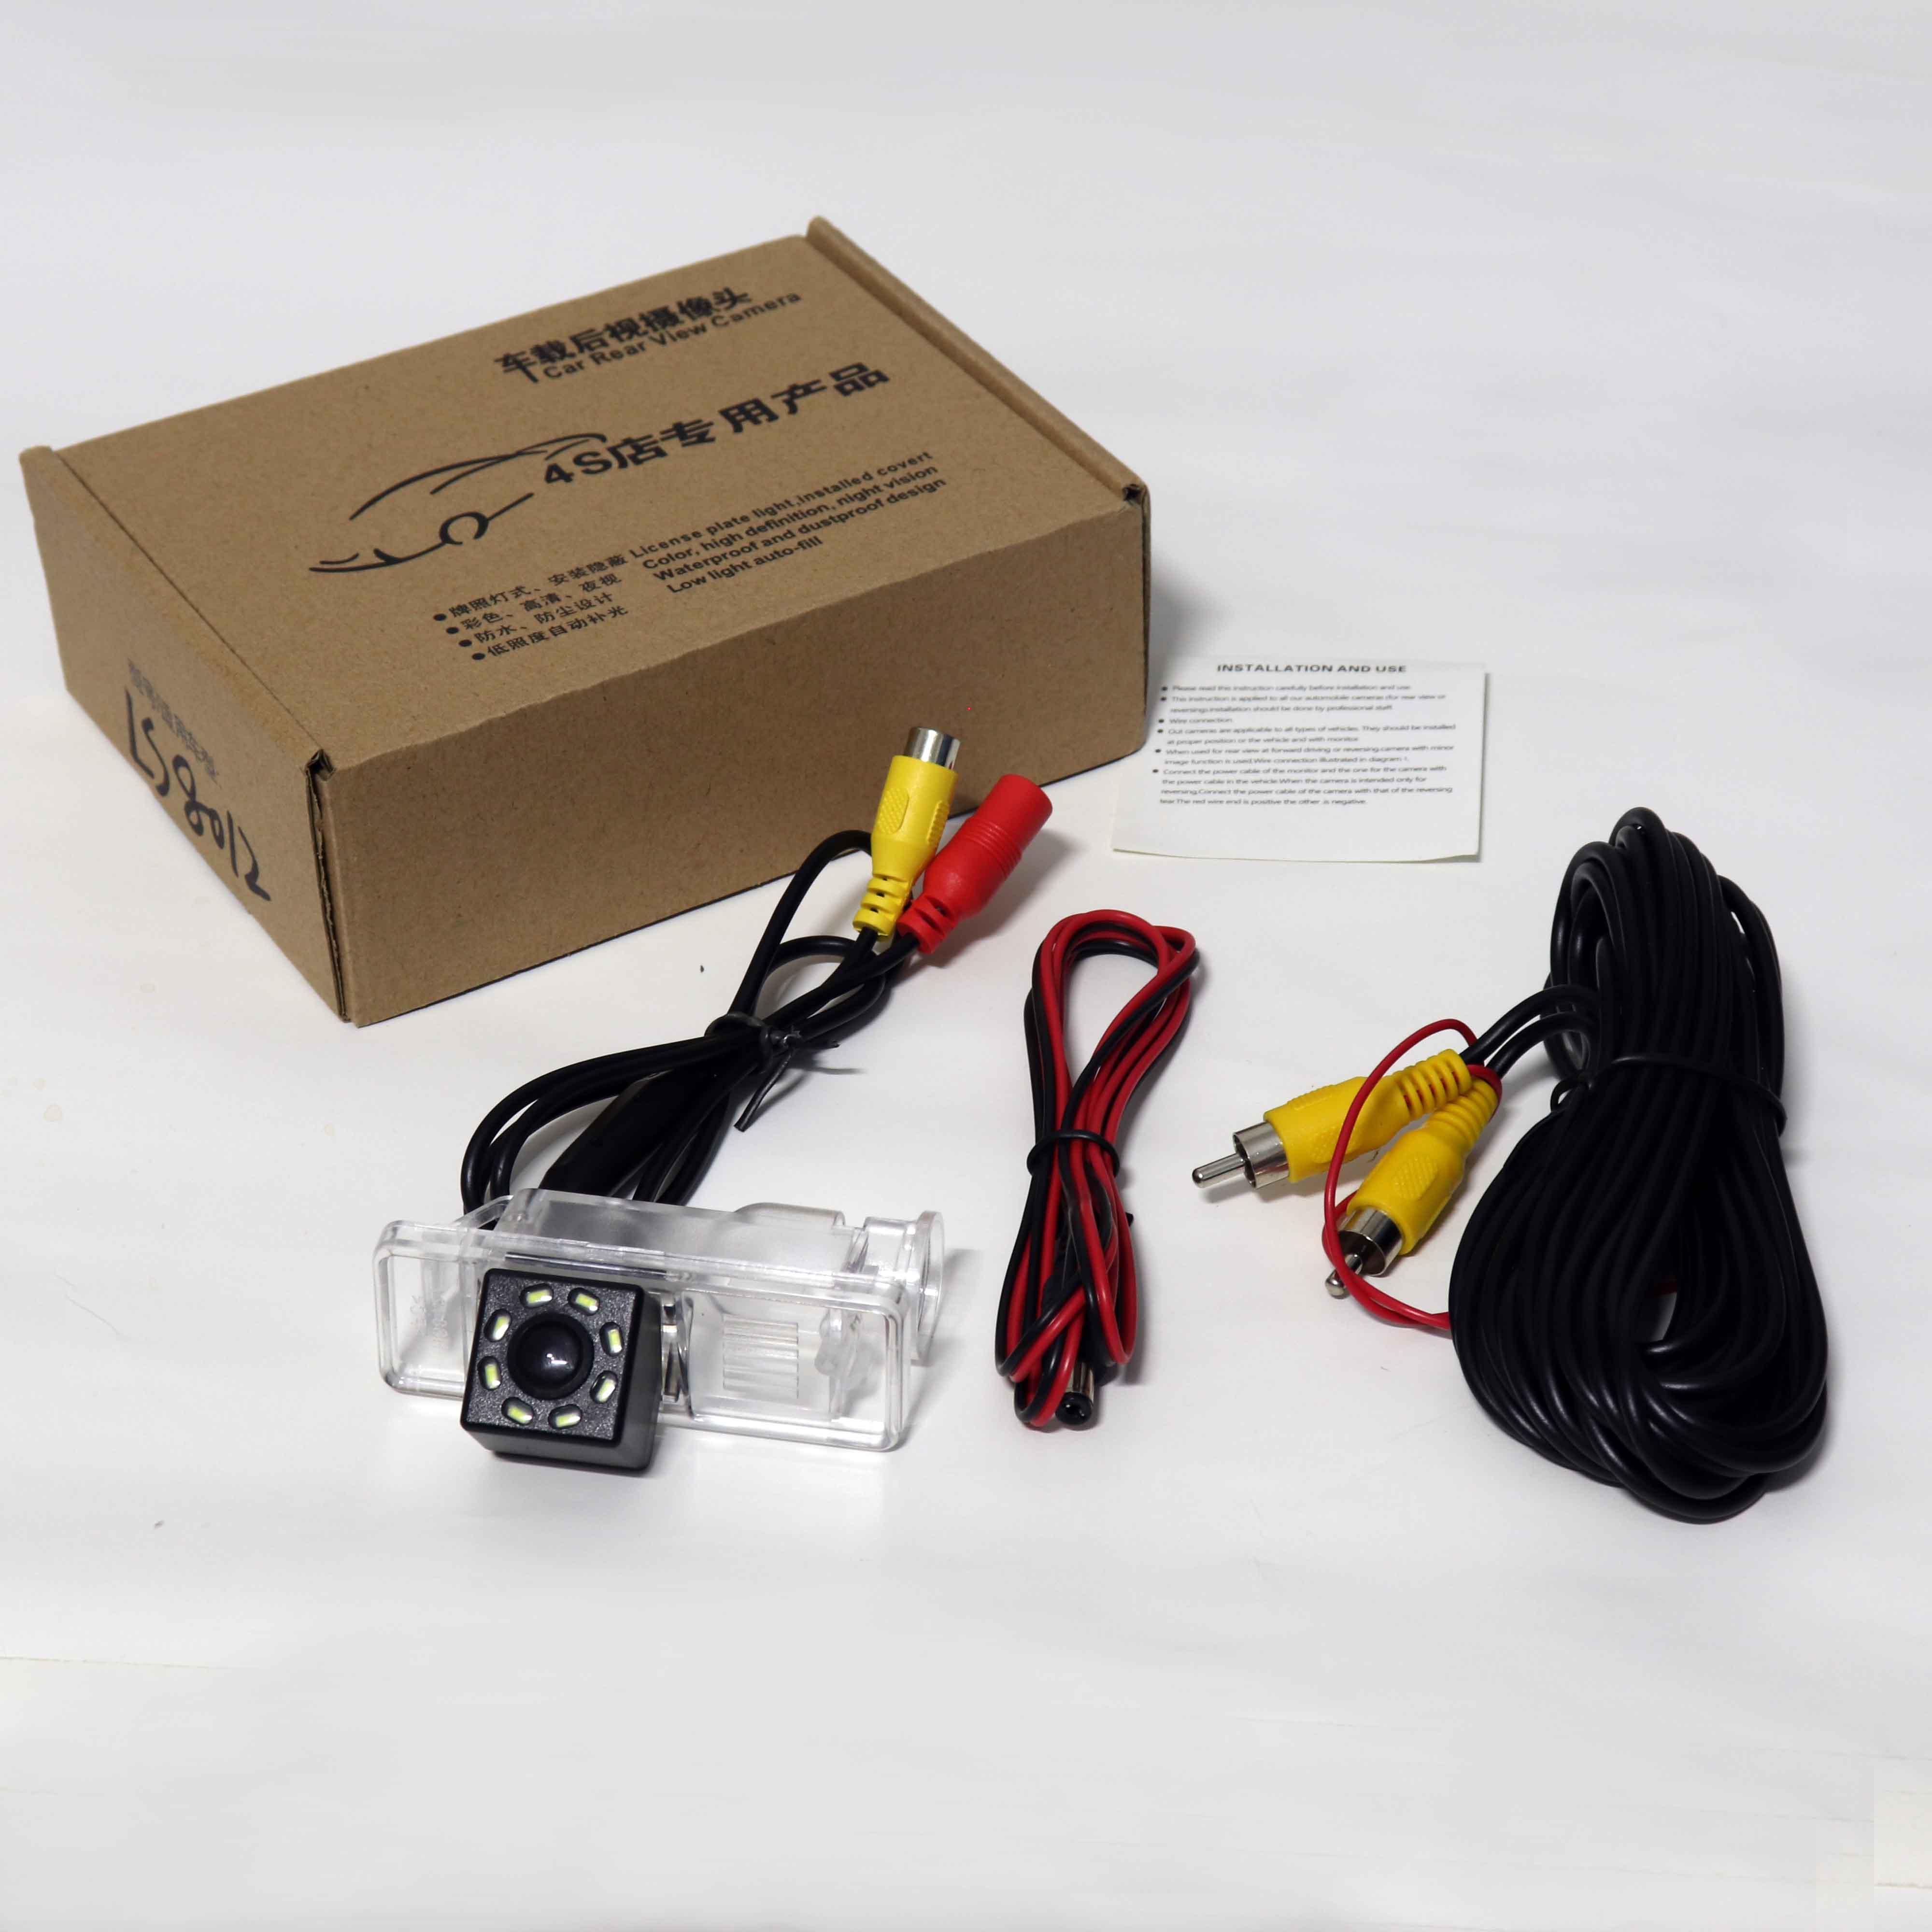 W906 NCV3 Car Rear View Parking Backup Camera For Mercedes Benz Sprinter